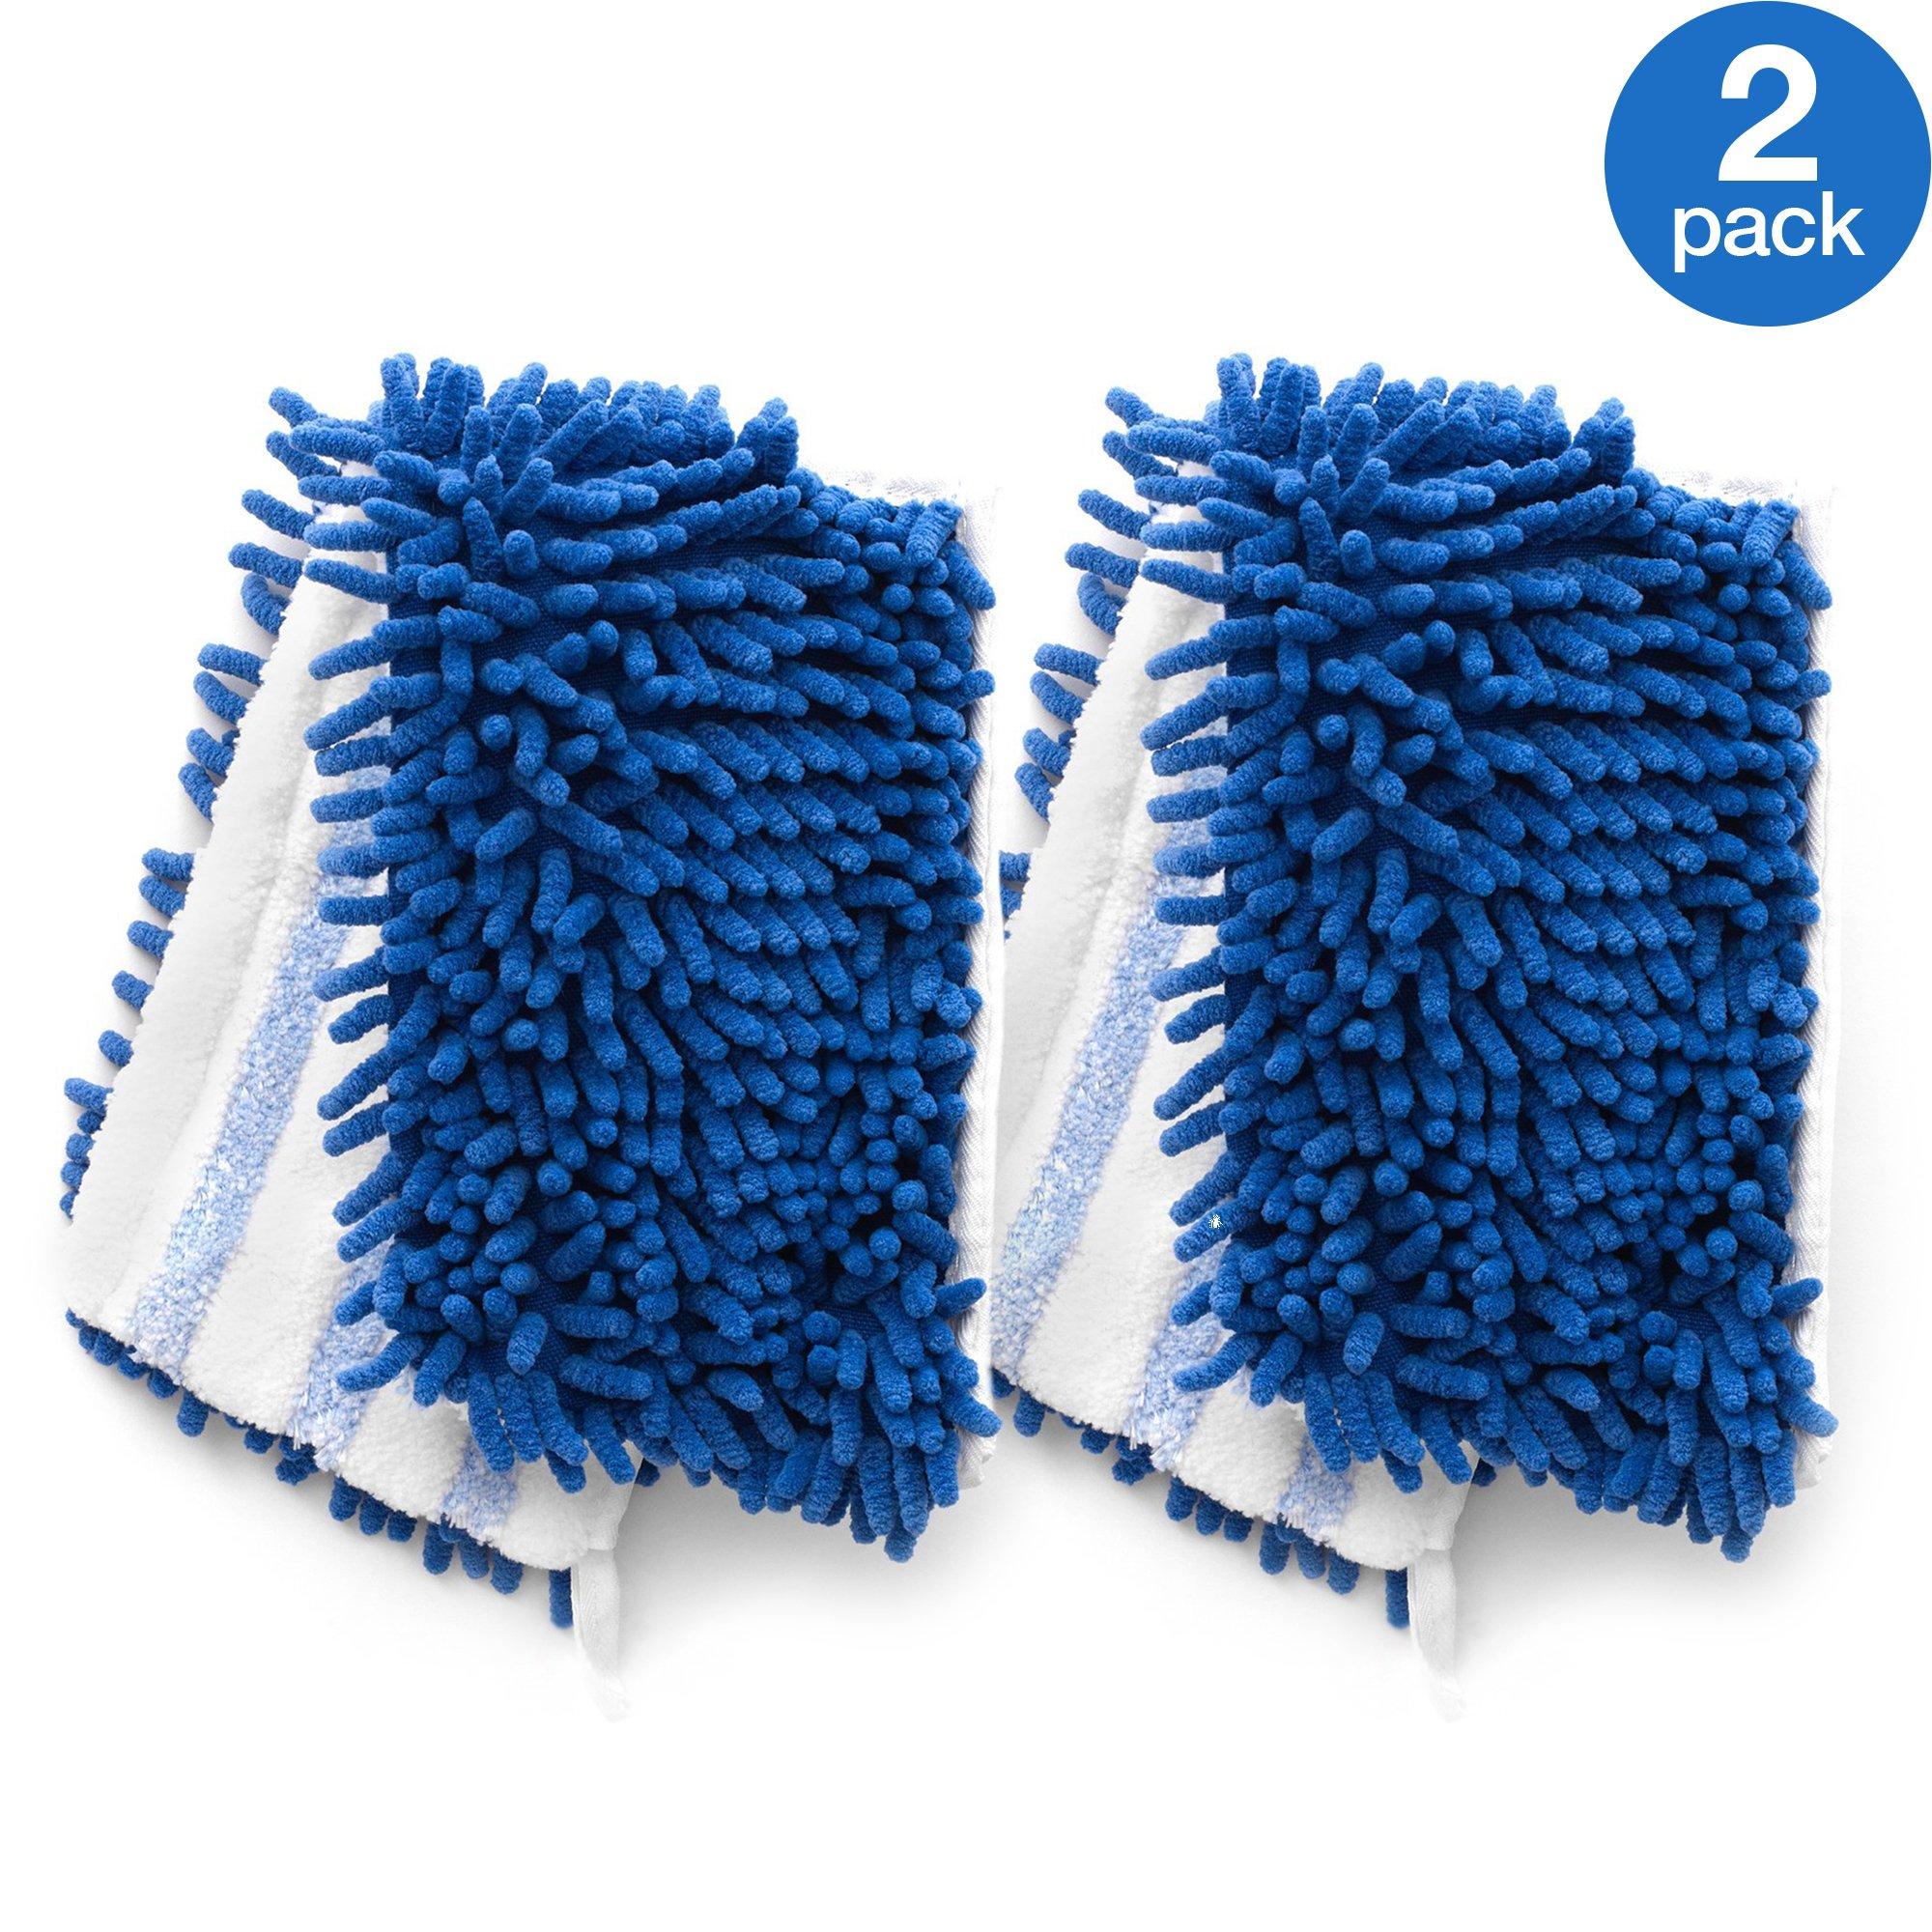 O-Cedar Dual-Action Microfiber Flip Mop Refill (Pack of 2)